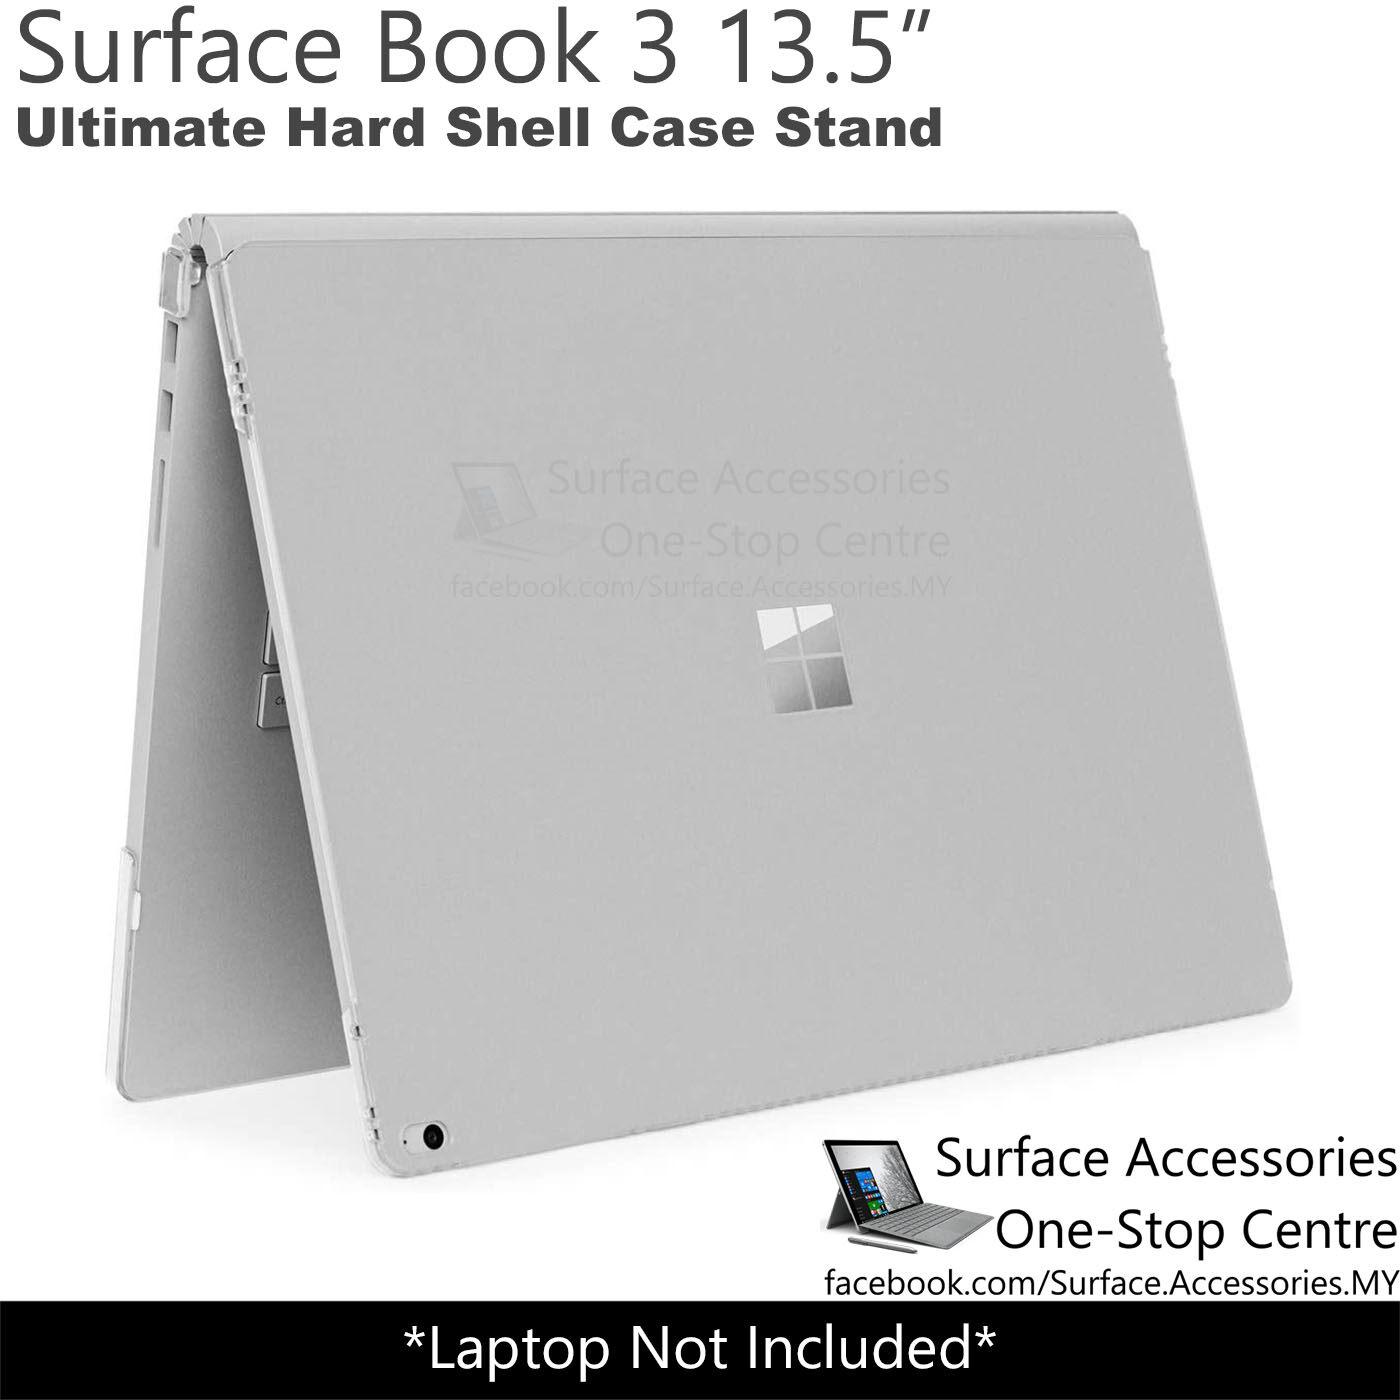 "[MALAYSIA]Microsoft Surface Book 3 13.5"" Ultimate Case Stand Cover Surface Book Flip Case Surface Book 3 Cover Surface Book 3 Stand for Surface Book 3 I5 i7 Model"